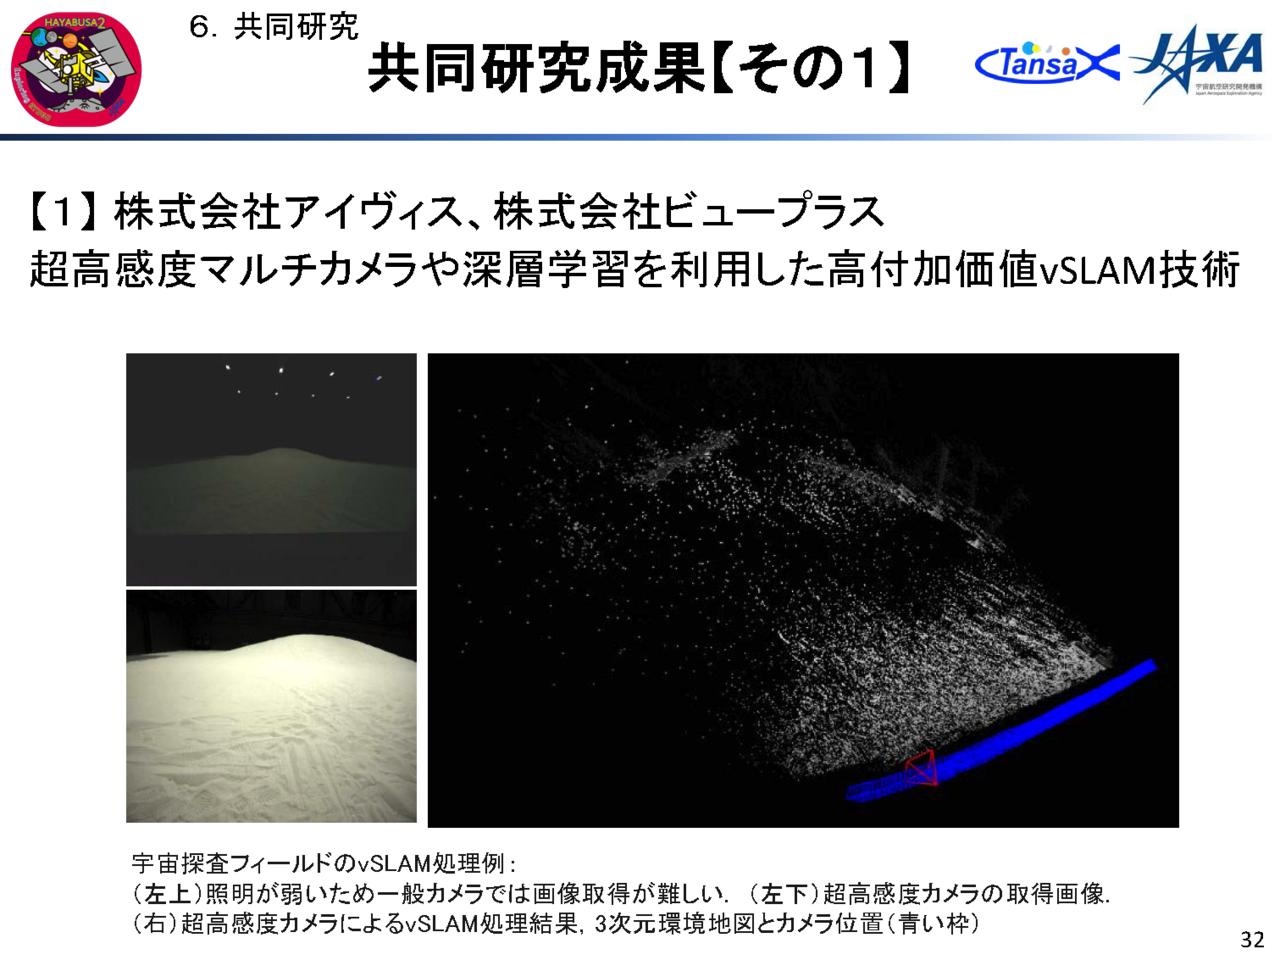 f:id:Imamura:20180802145952p:plain